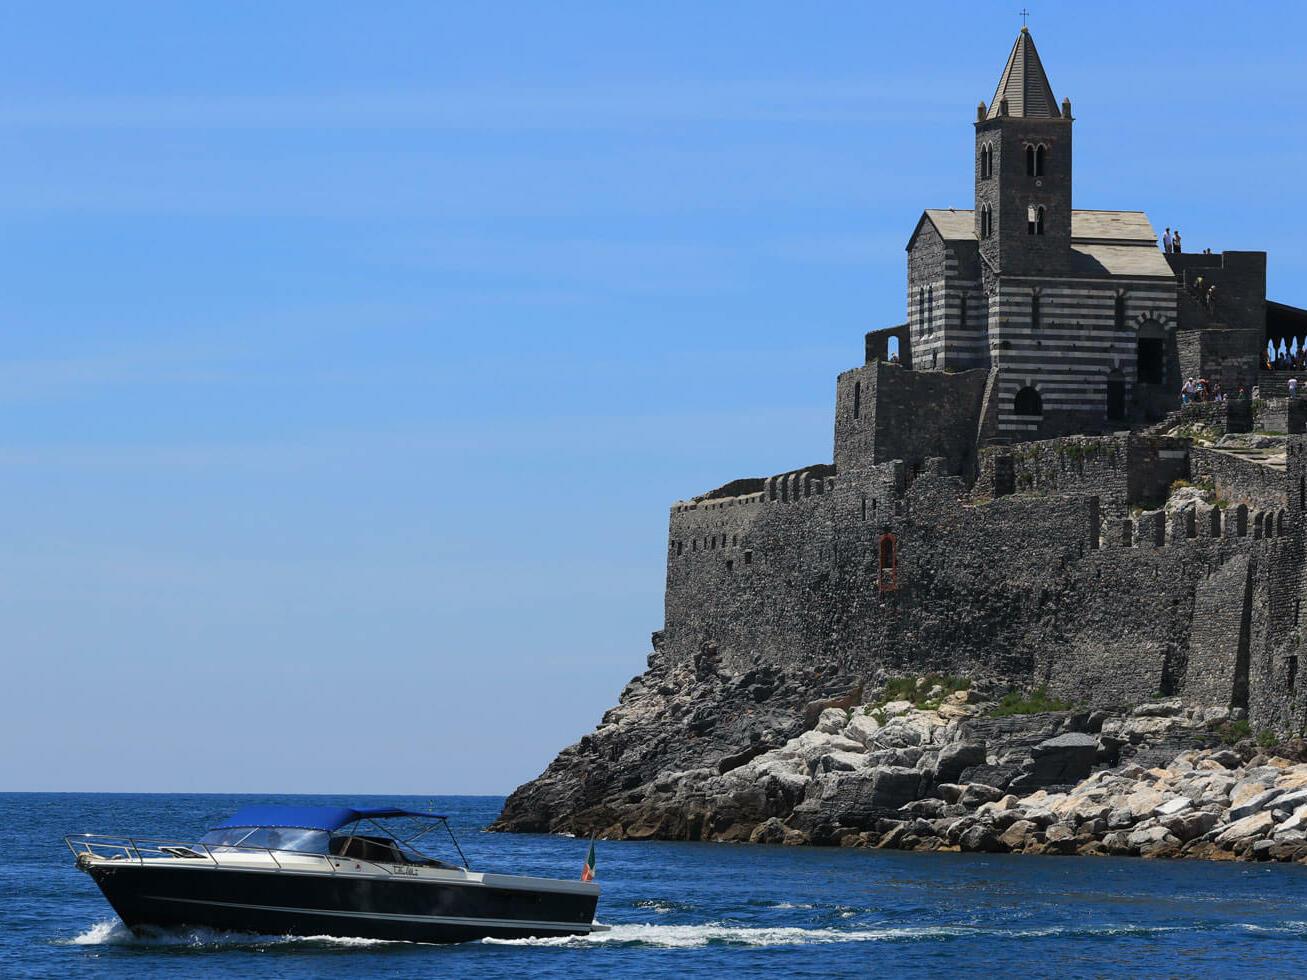 Church and moto boat -  Grand Hotel Portovenere